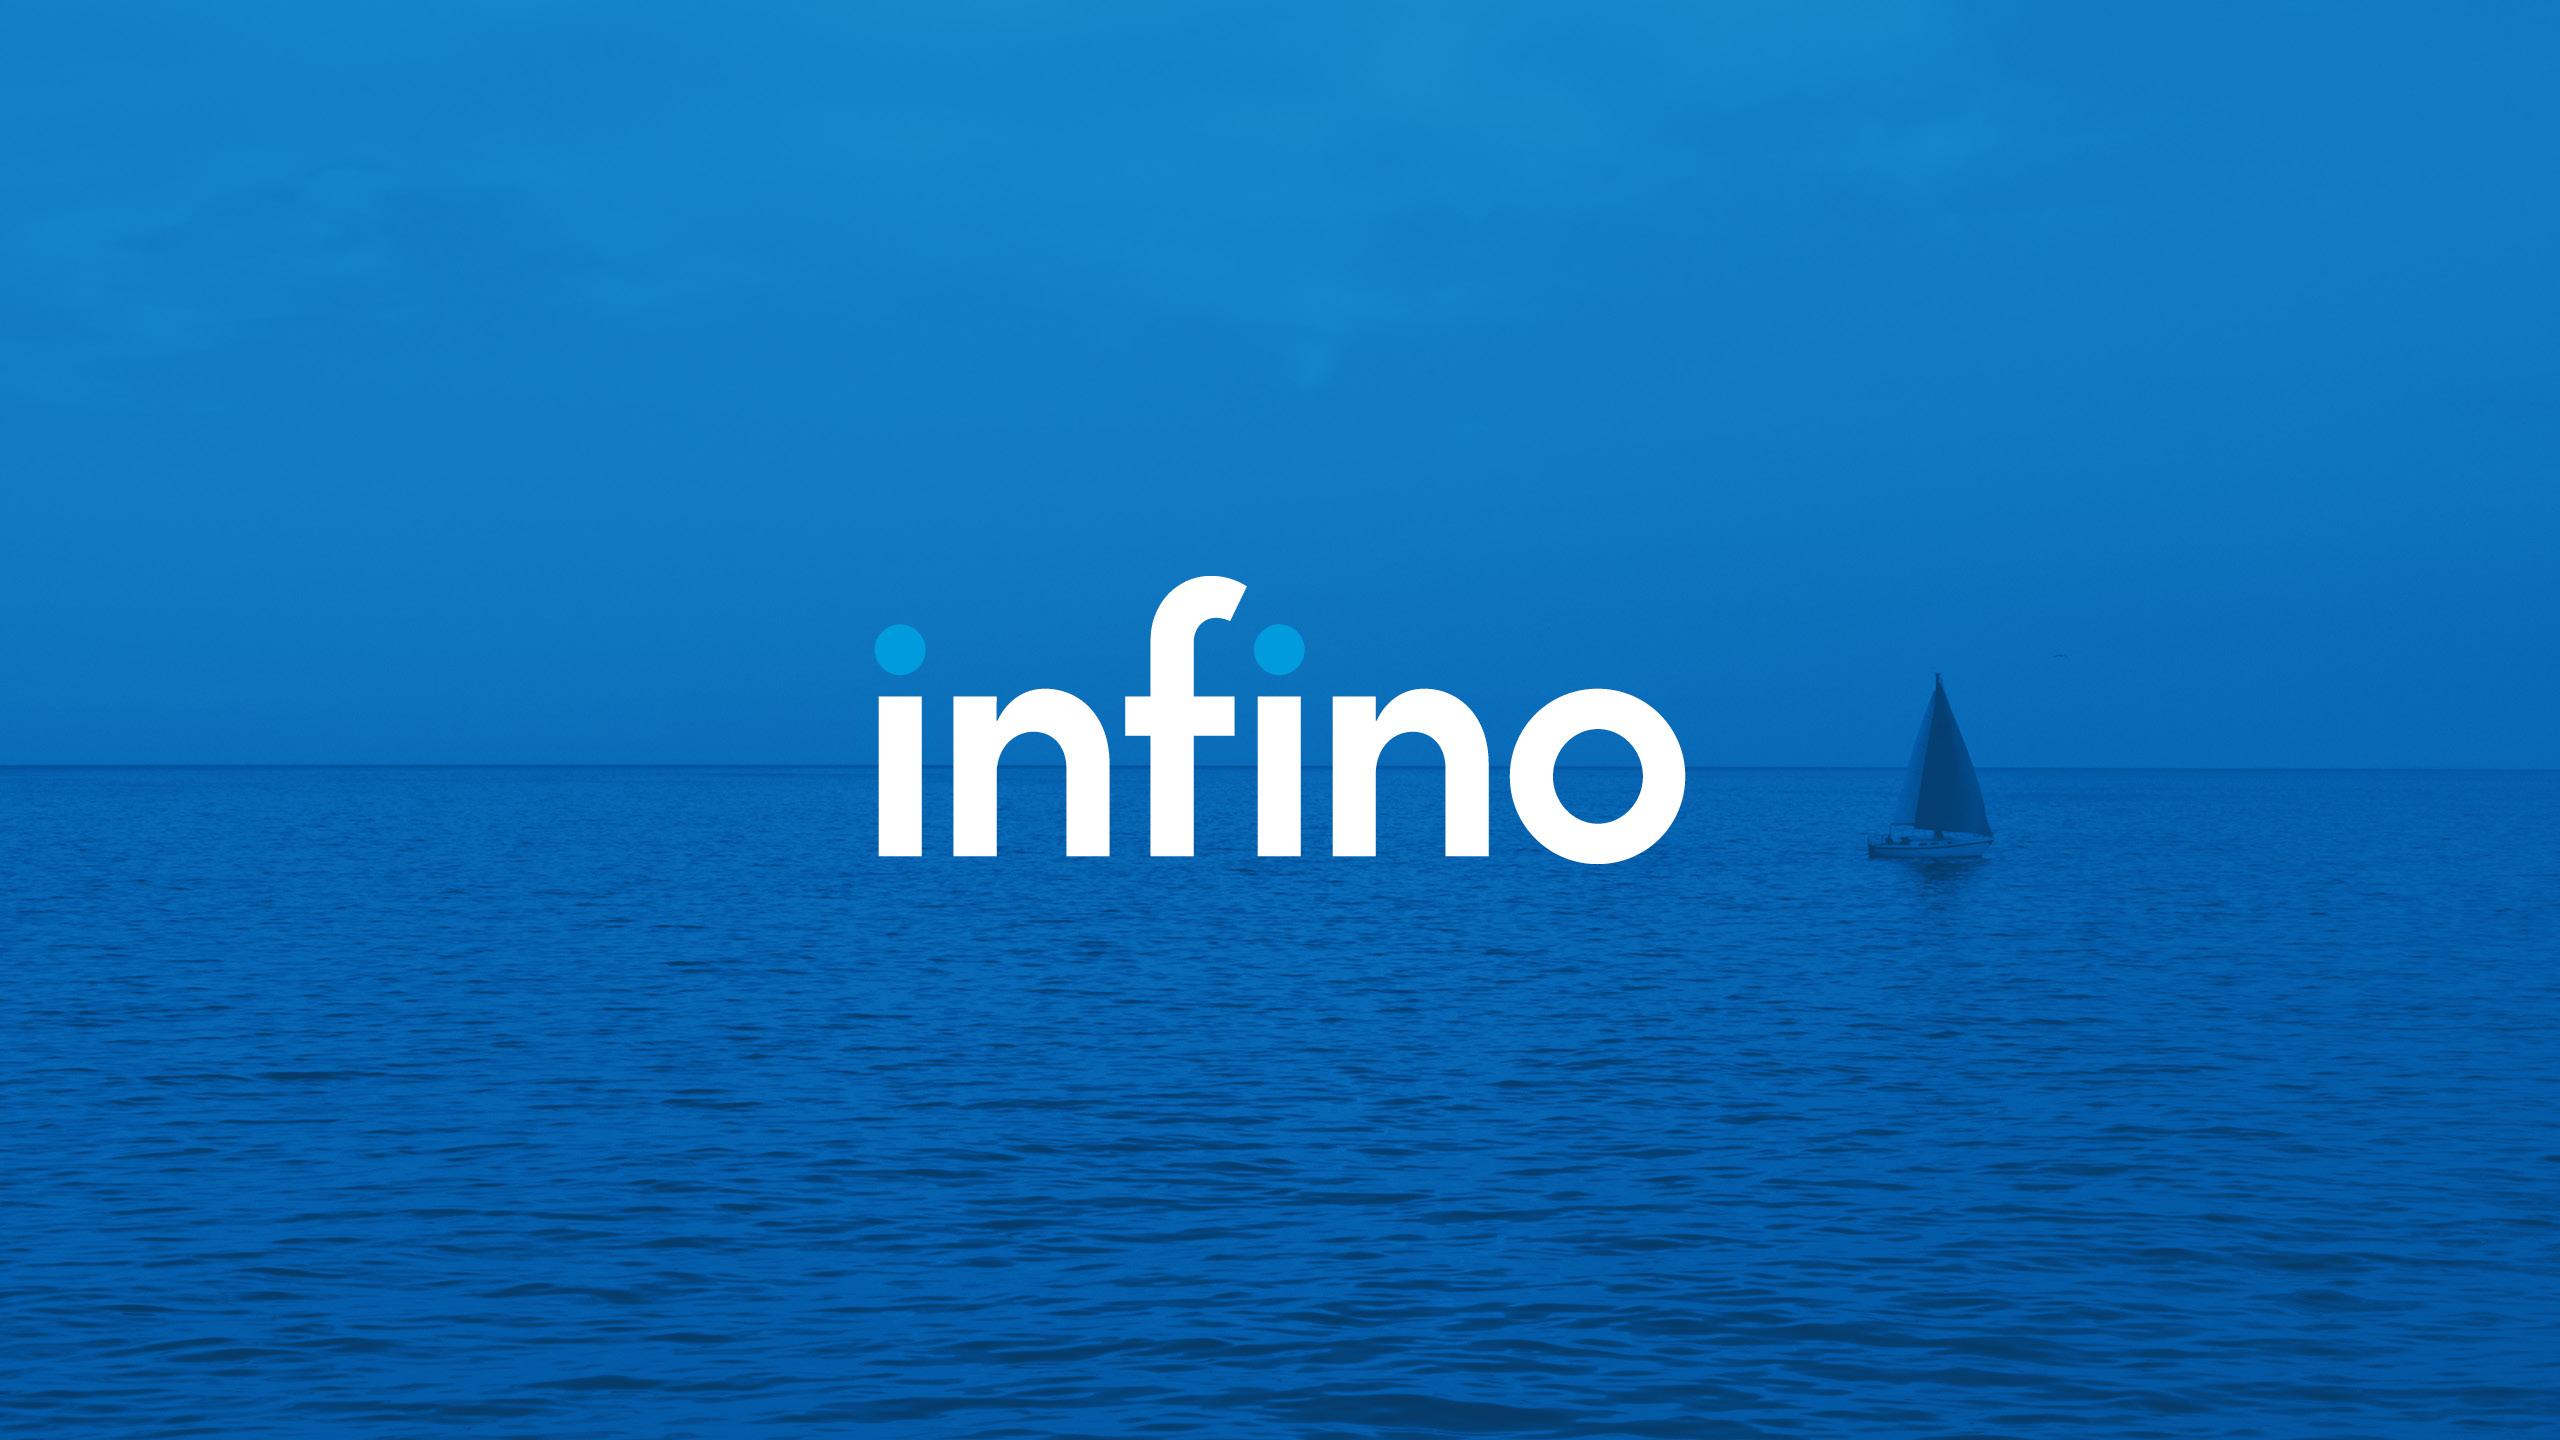 Portfolio_Infino_09